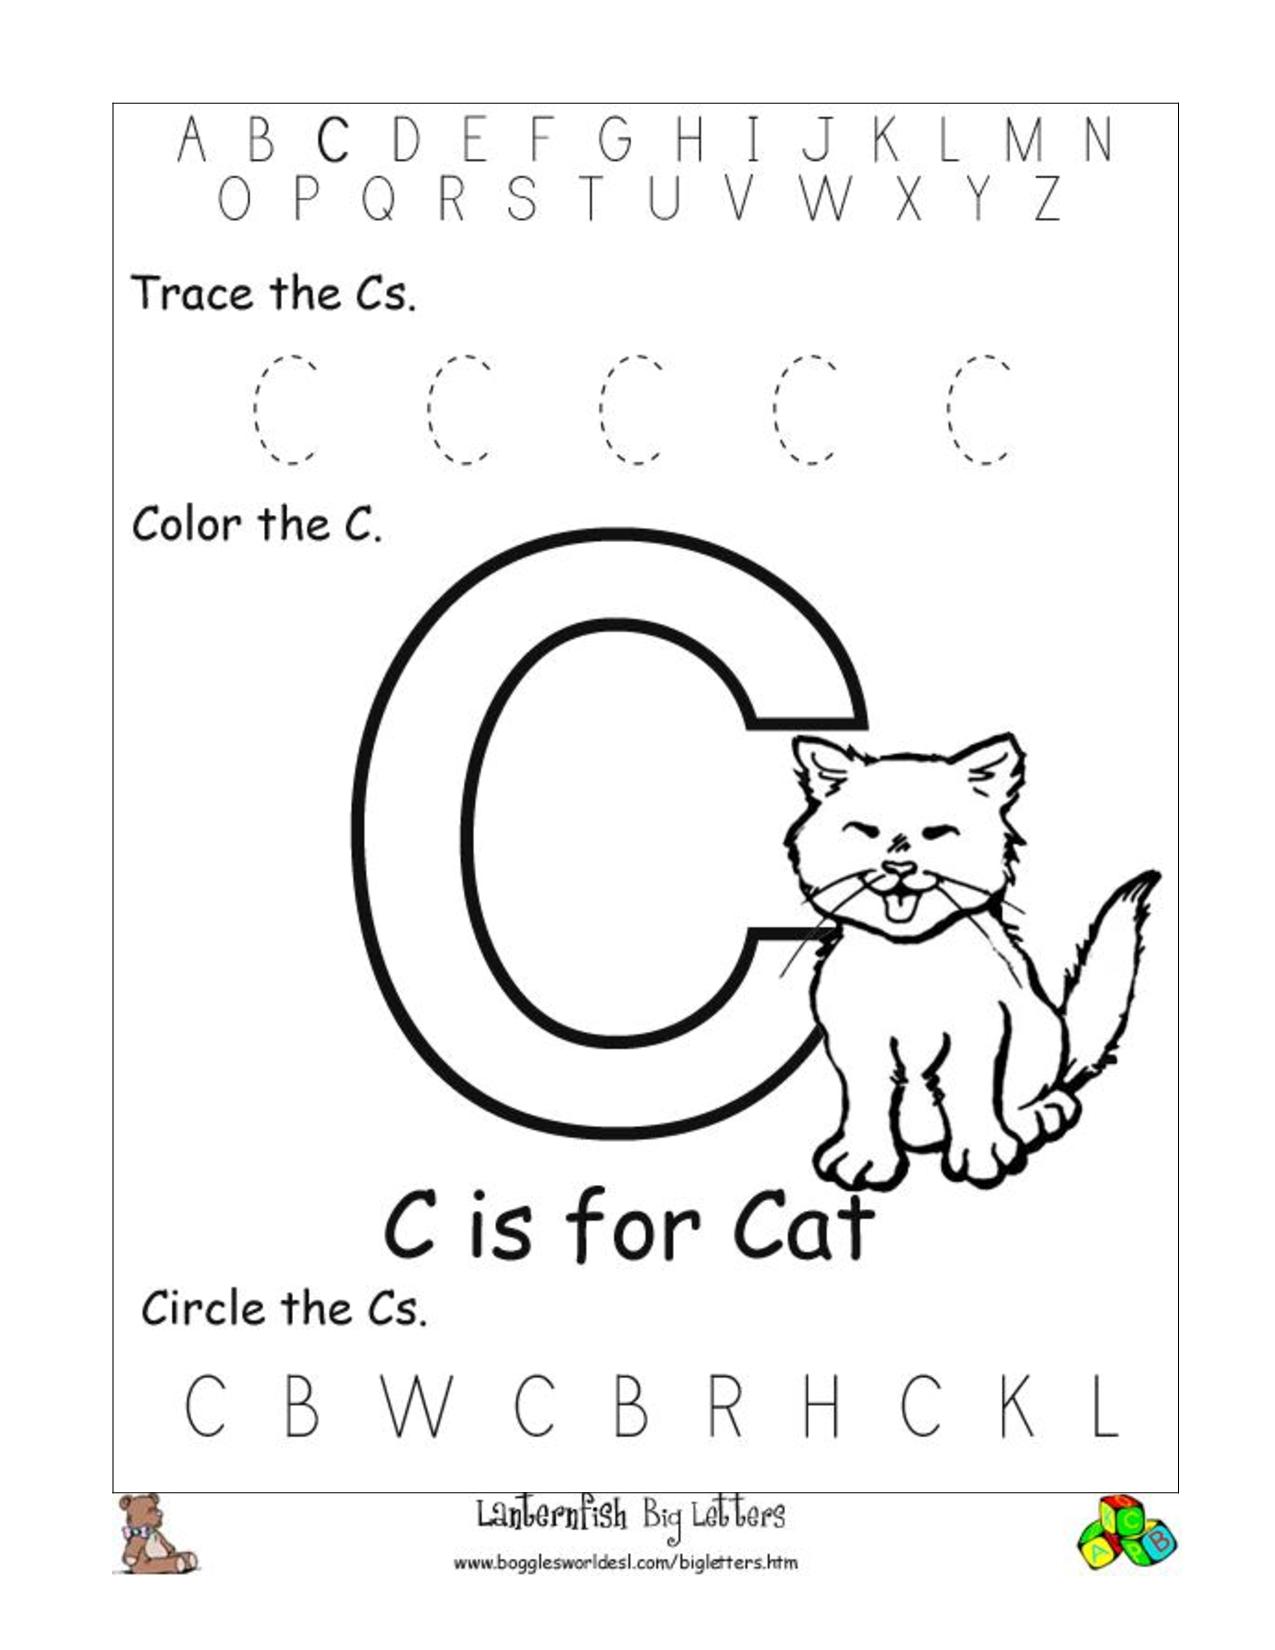 6 Best Images Of Free Printable Preschool Worksheets Letter C | Day - Free Printable Preschool Worksheets Letter C